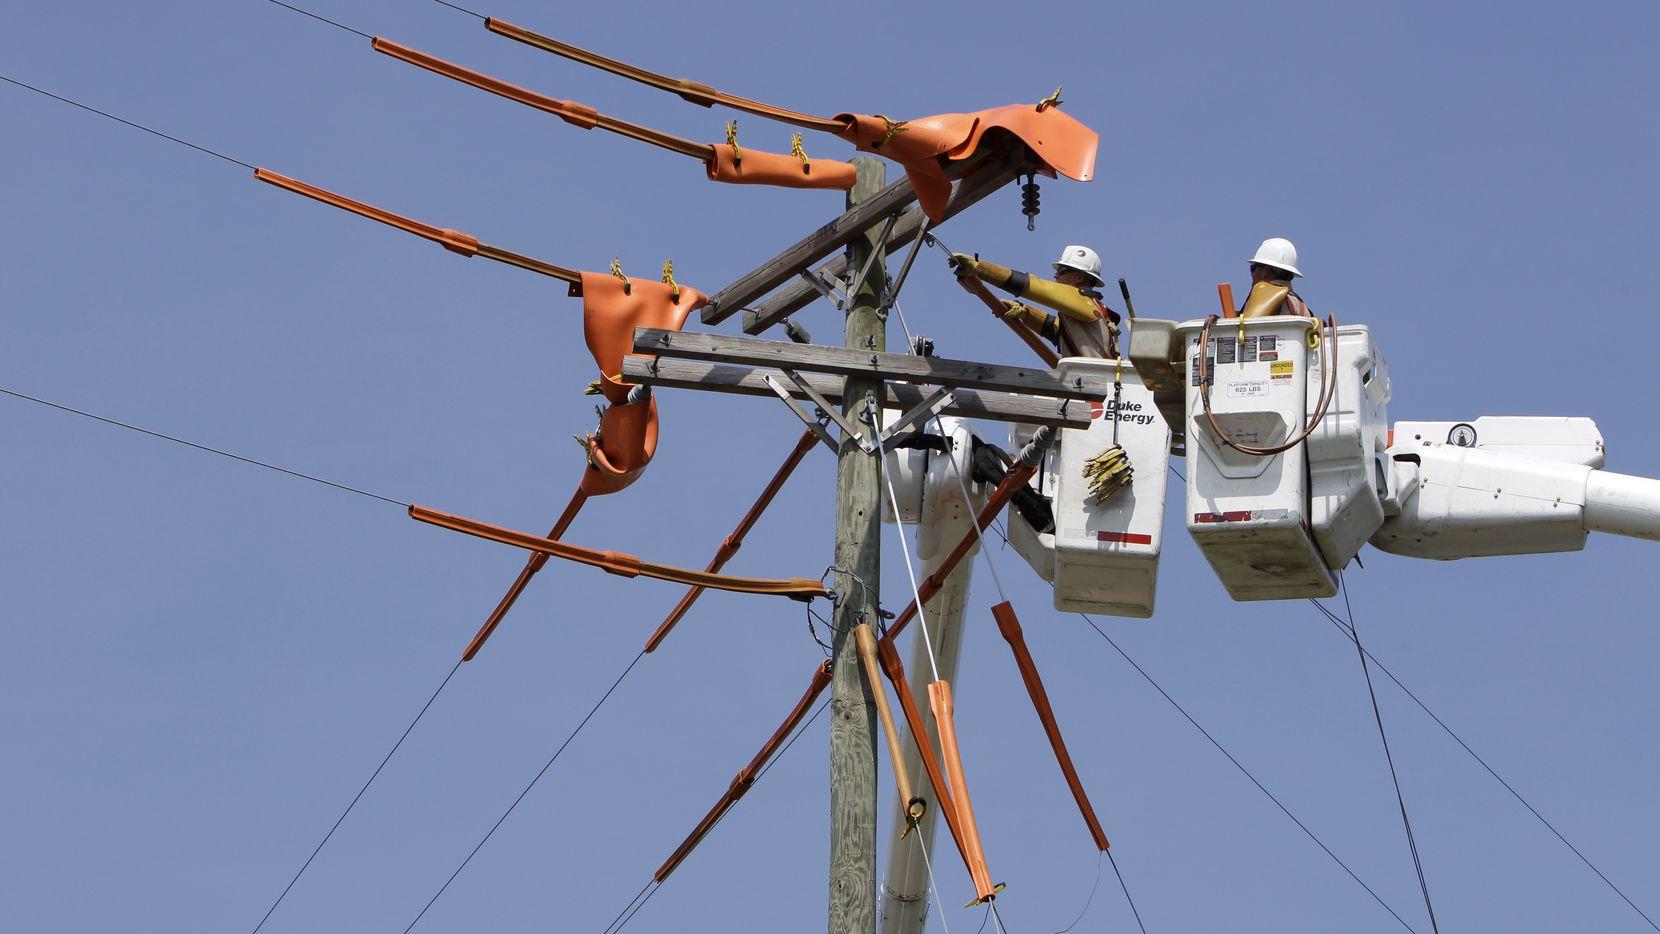 In this 2010 photo, Duke Energy linesmen work on power lines in Charlotte, N.C.